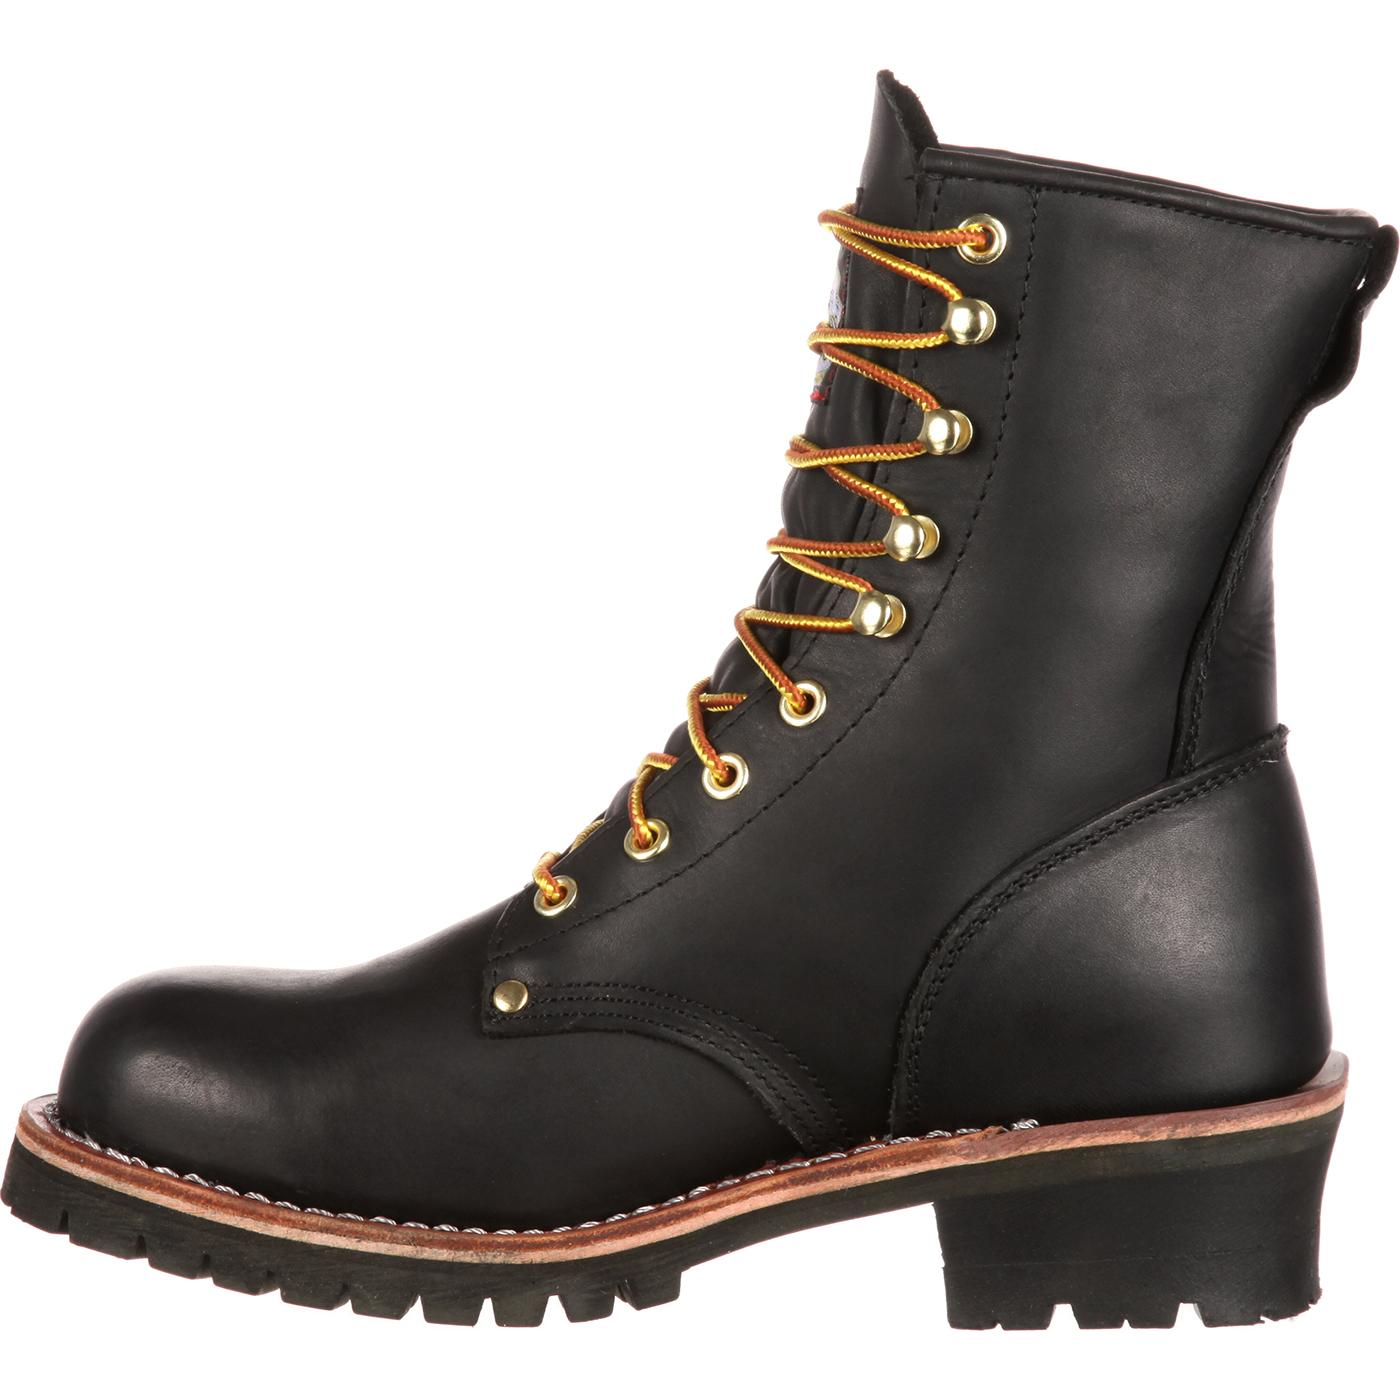 77844867698 Georgia Boot  Men s Steel Toe Black Logger Work Boot - Style  G8320